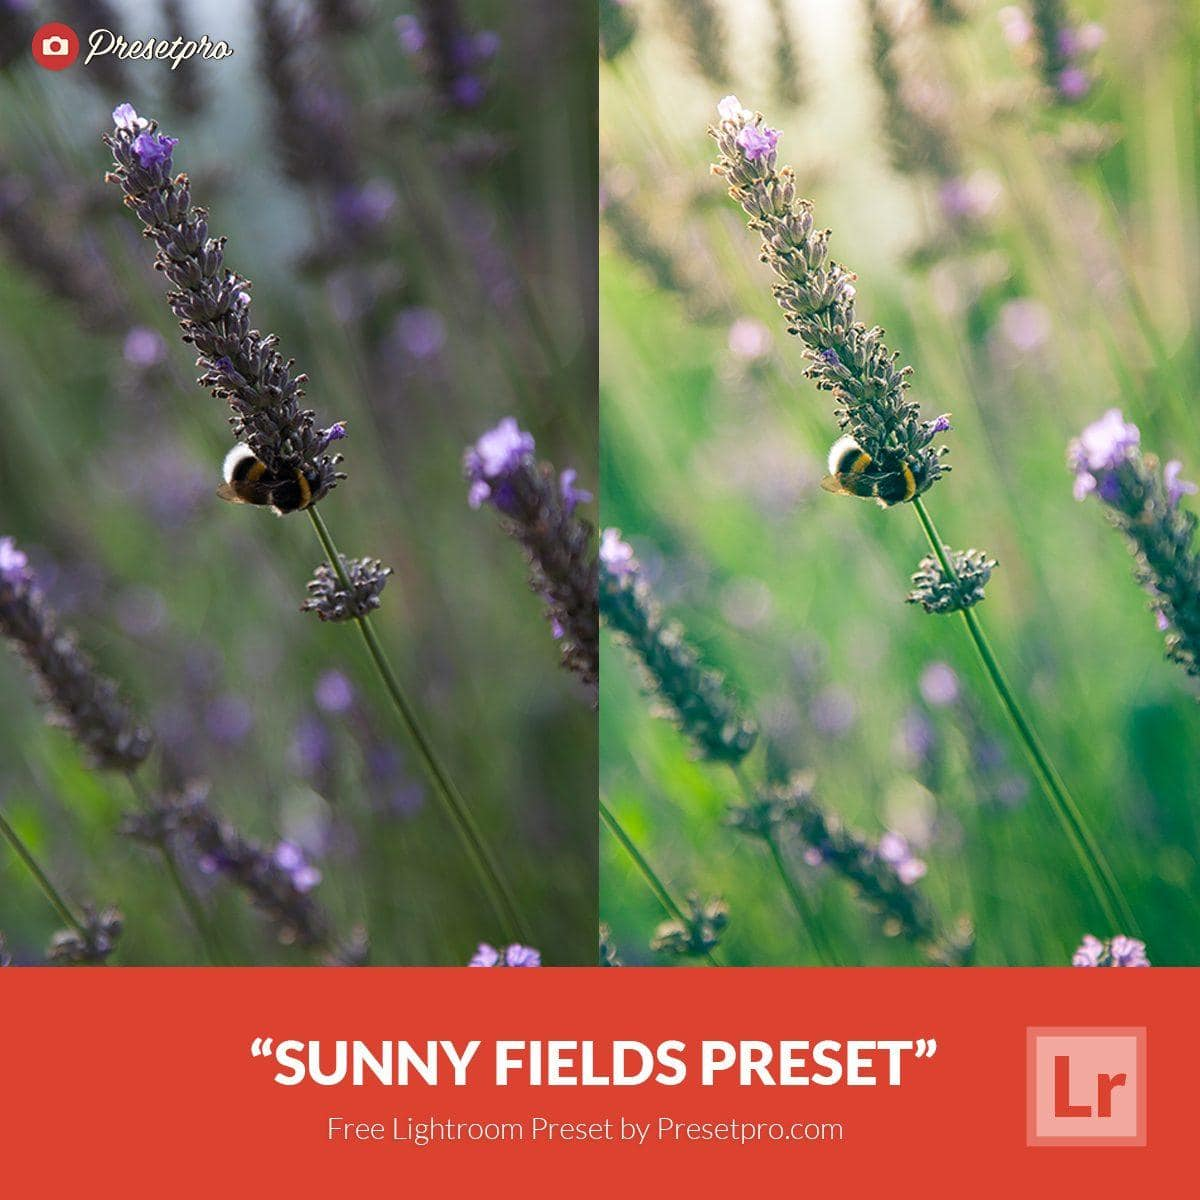 Free-Lightroom-Presets-Sunny-Fields